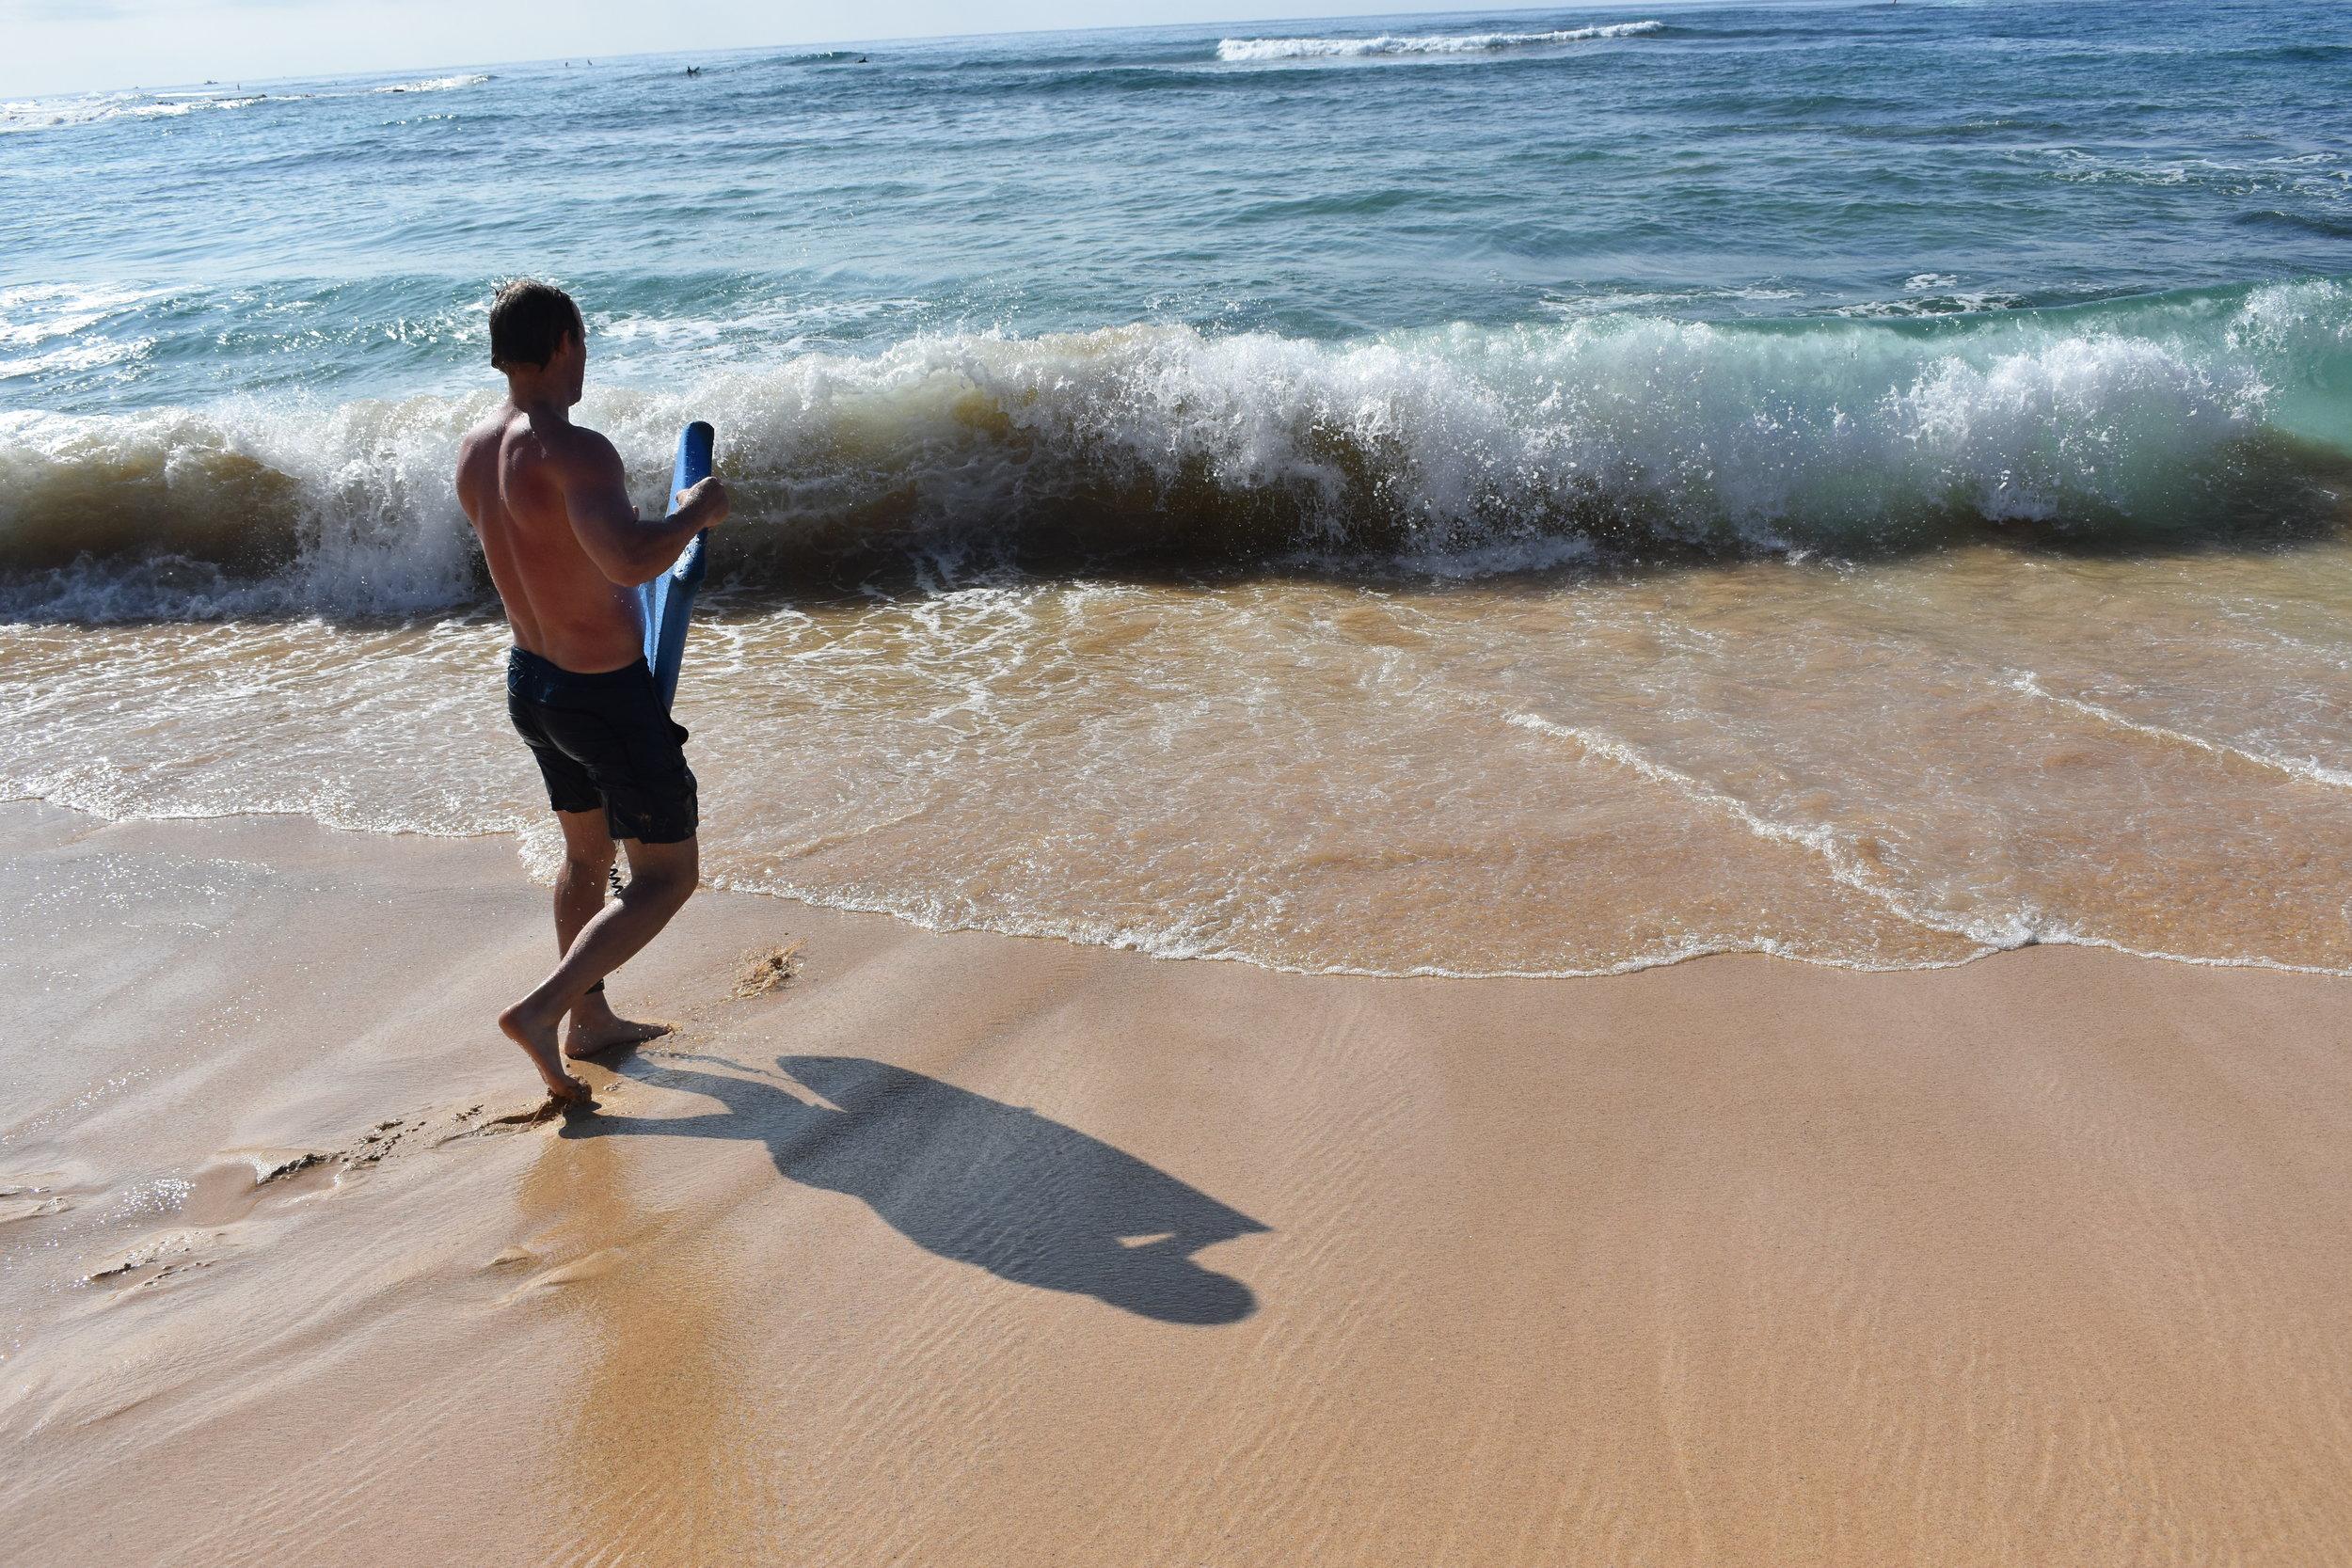 boogie-boarding-on-poipu-beach